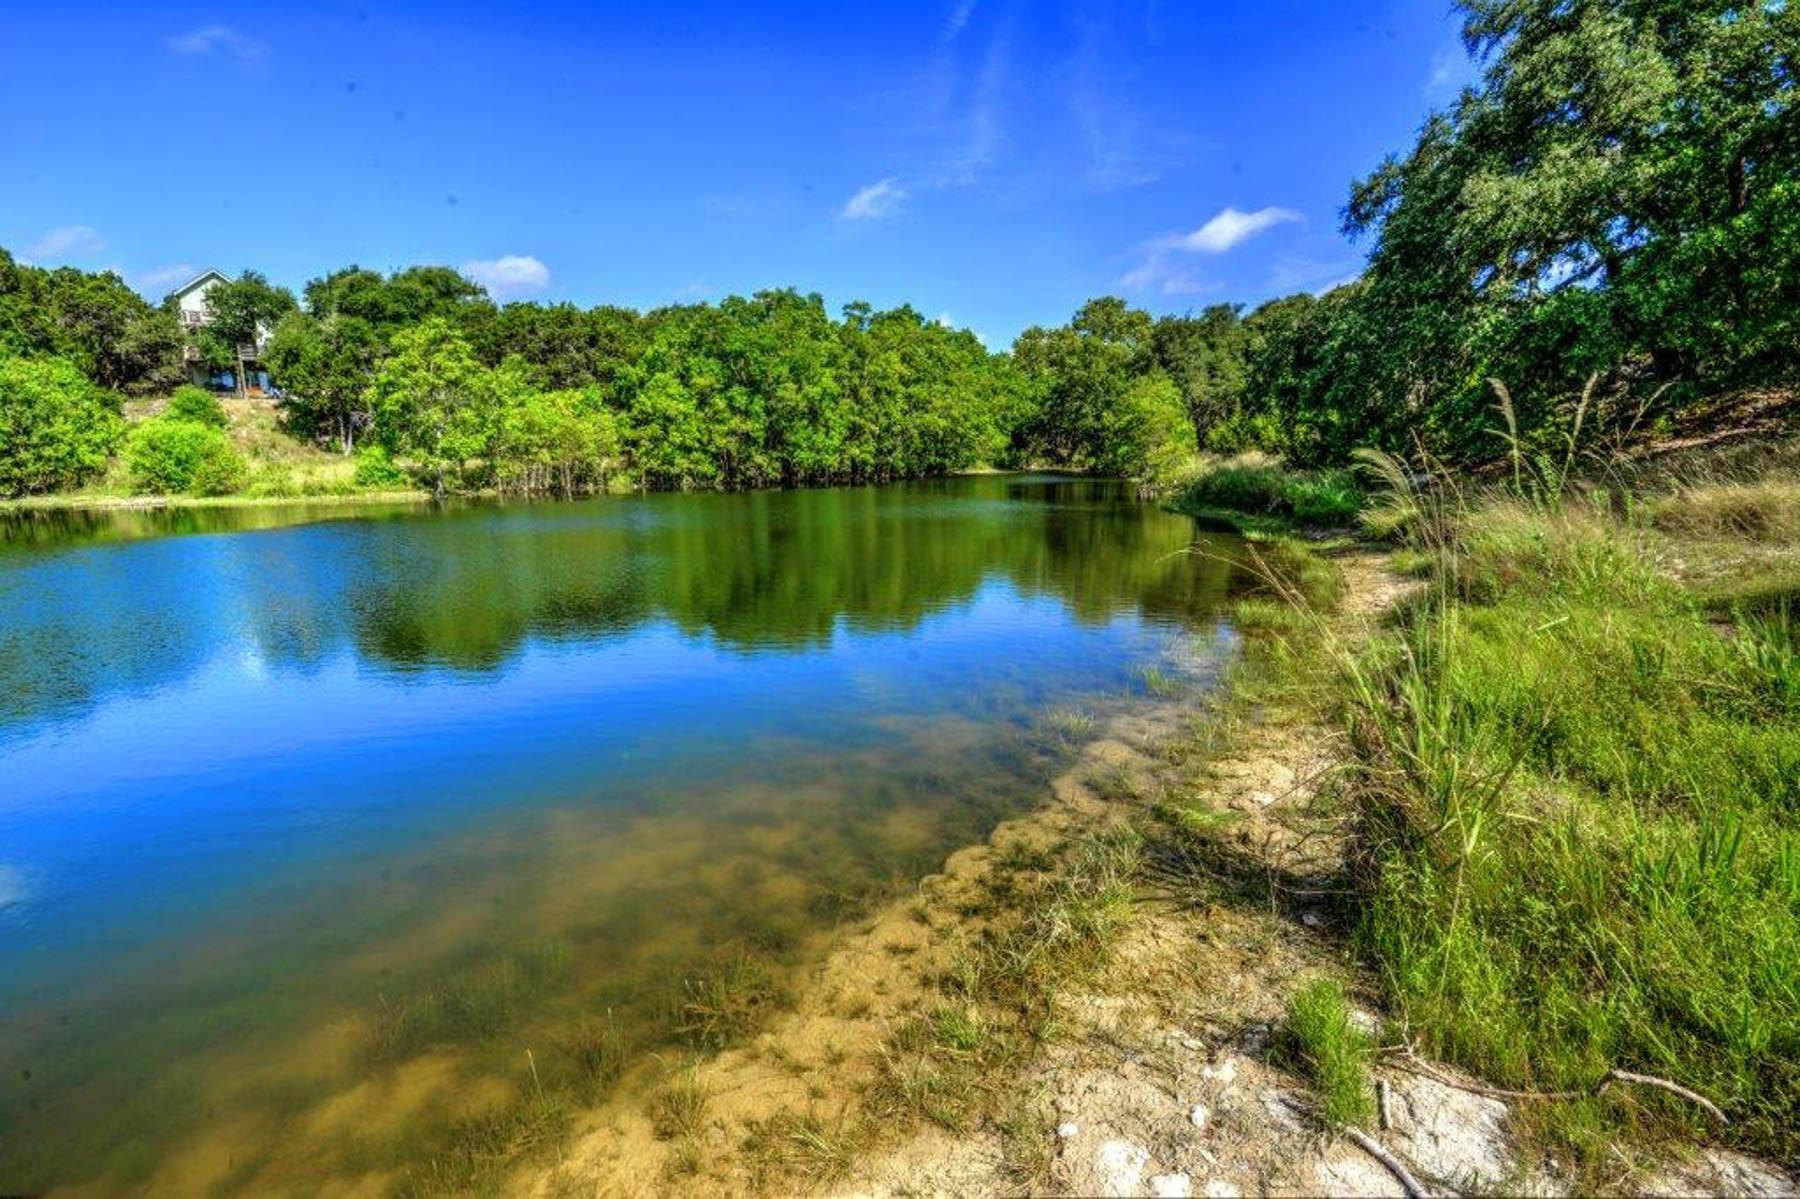 Land for Sale at Canyon Lake Lakefront Lots 1580 Canyon Lake Dr Canyon Lake, Texas 78133 United States